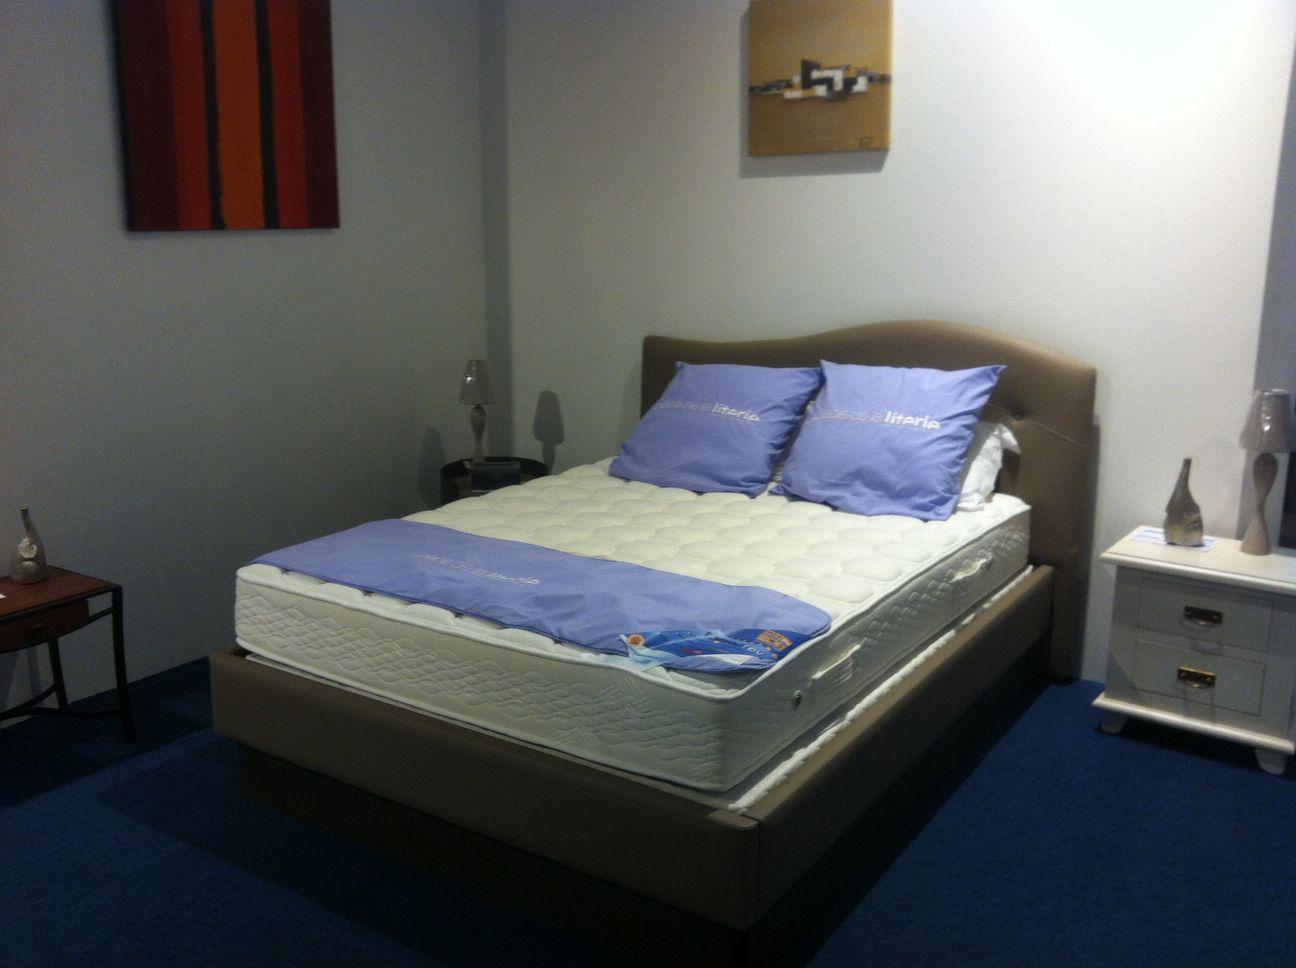 promotion lit rio concept habitat 43 le puy en velay. Black Bedroom Furniture Sets. Home Design Ideas